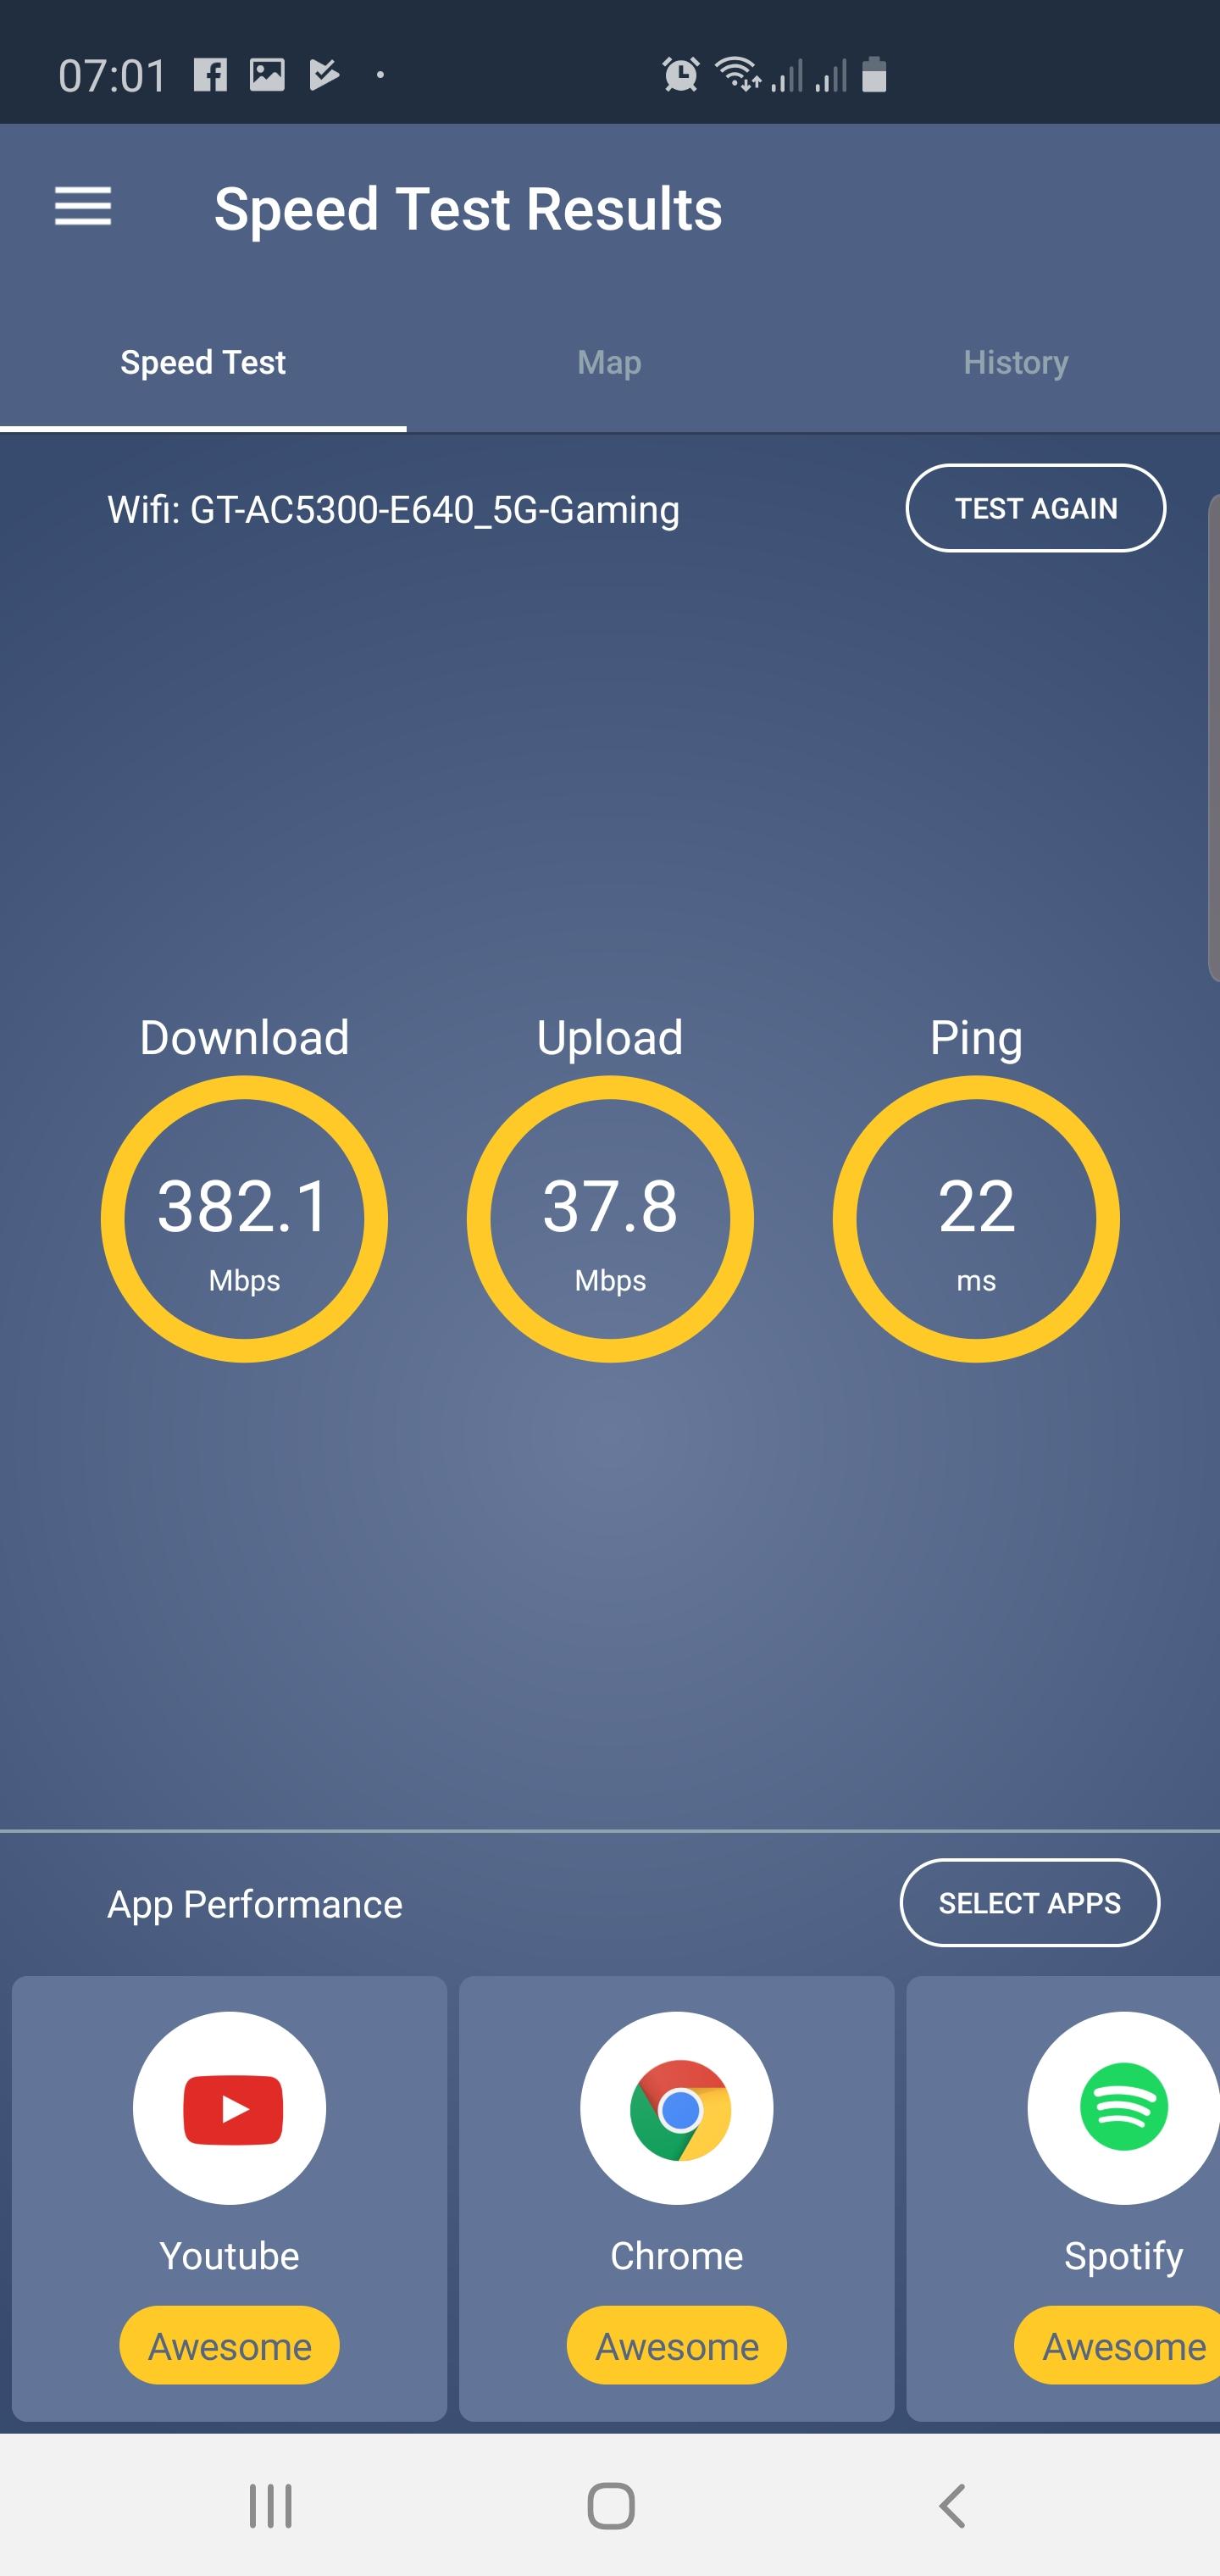 Solved: When will upload speeds increase - Virgin Media